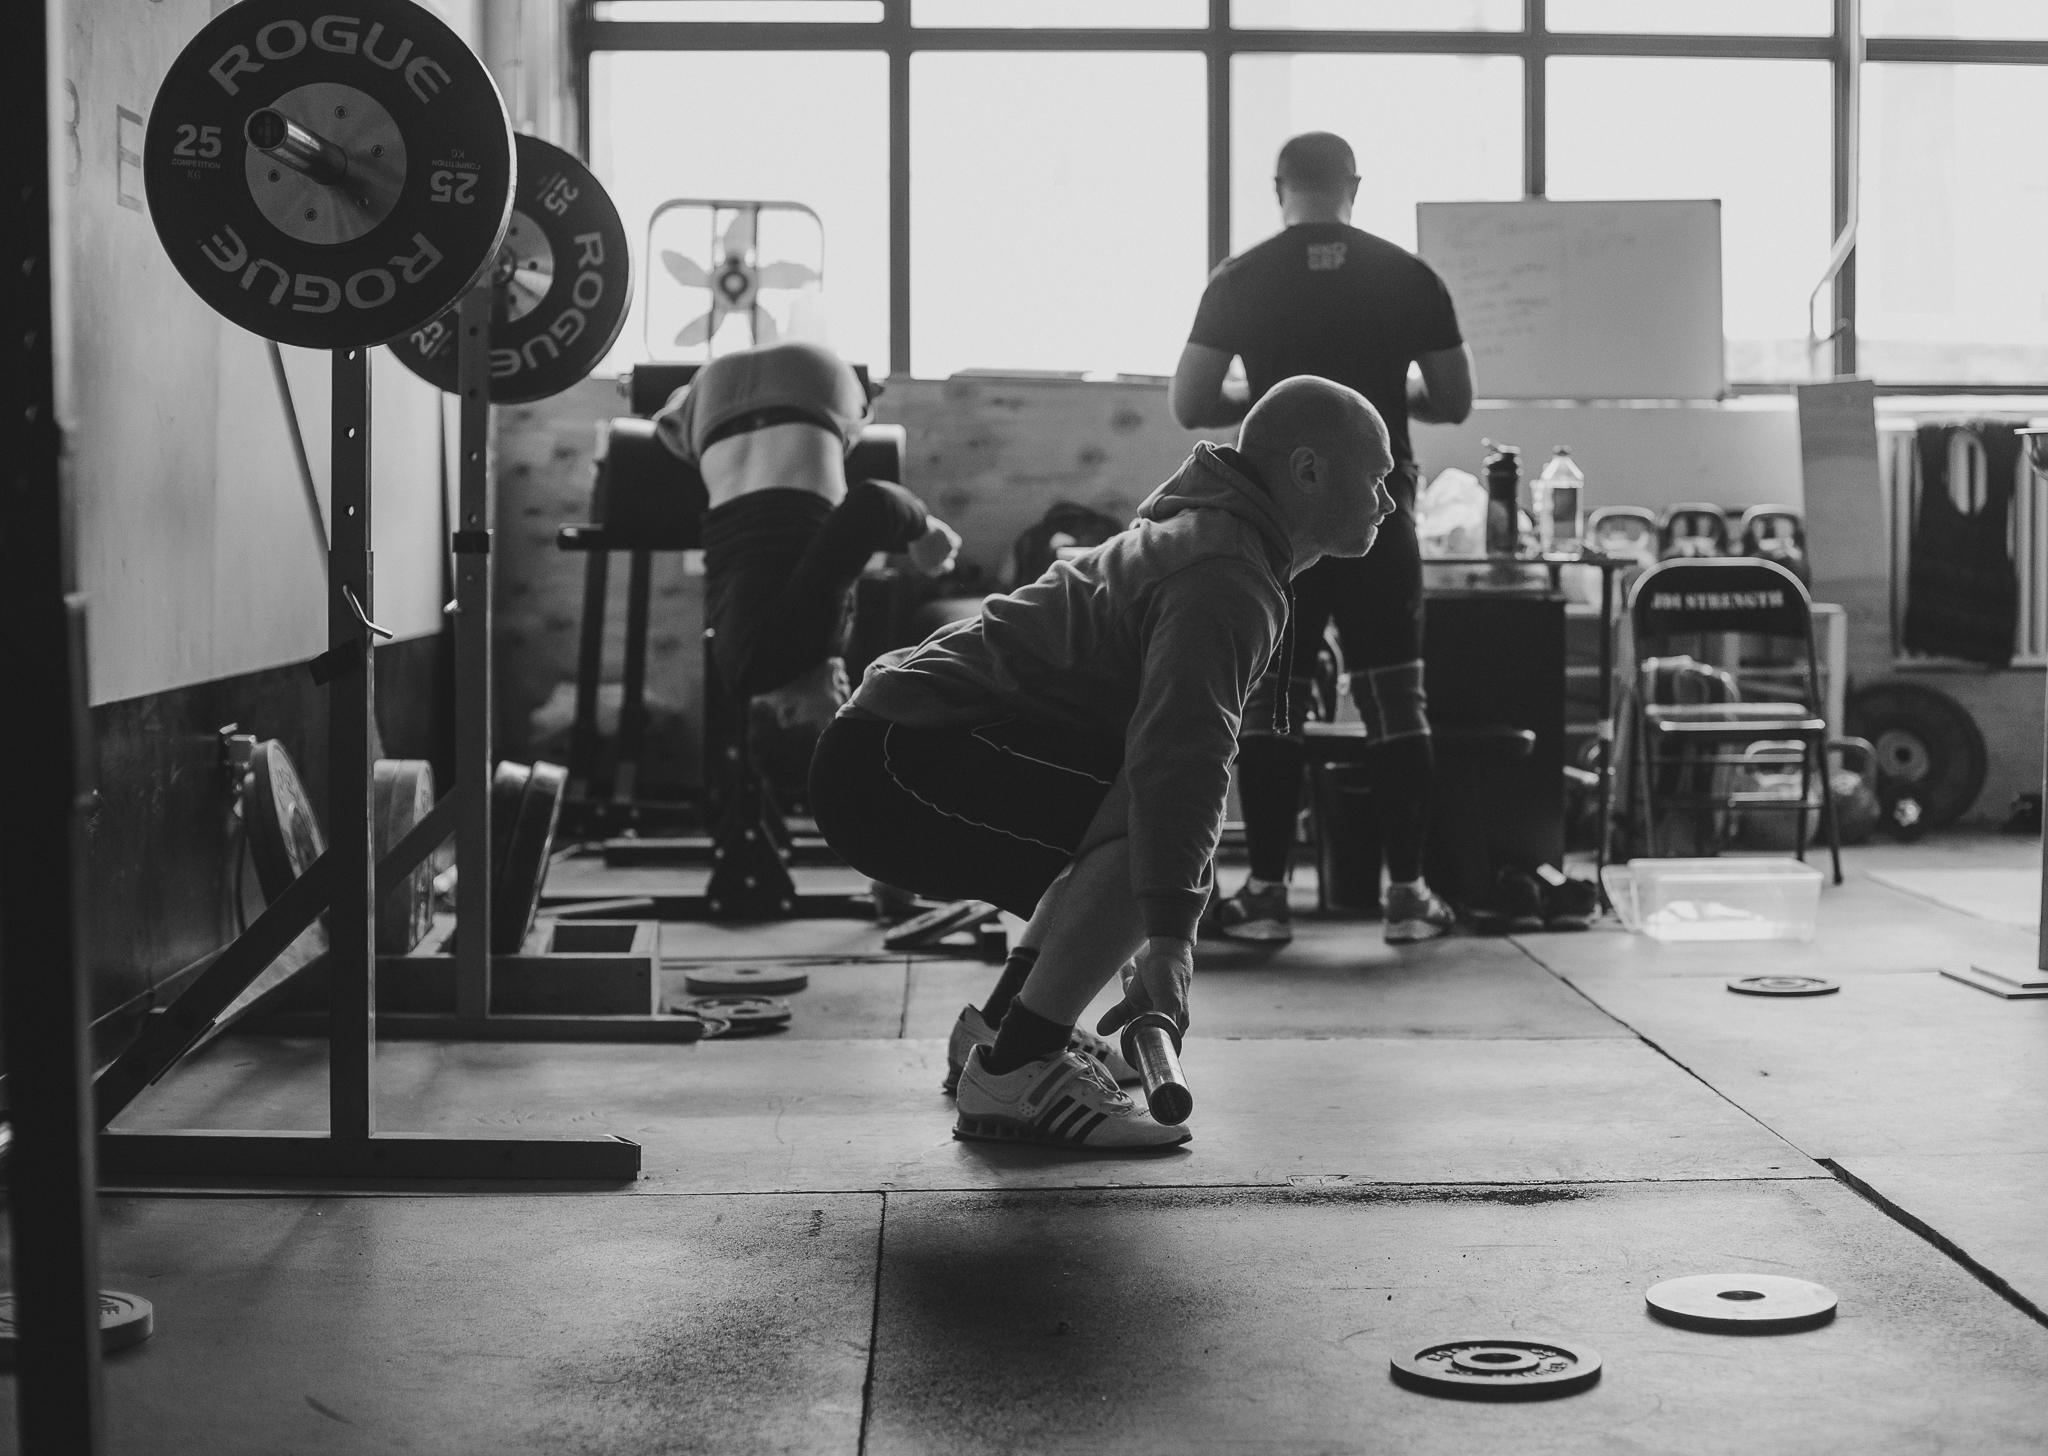 yasha-kahn-weightlifting-coach-26.jpg